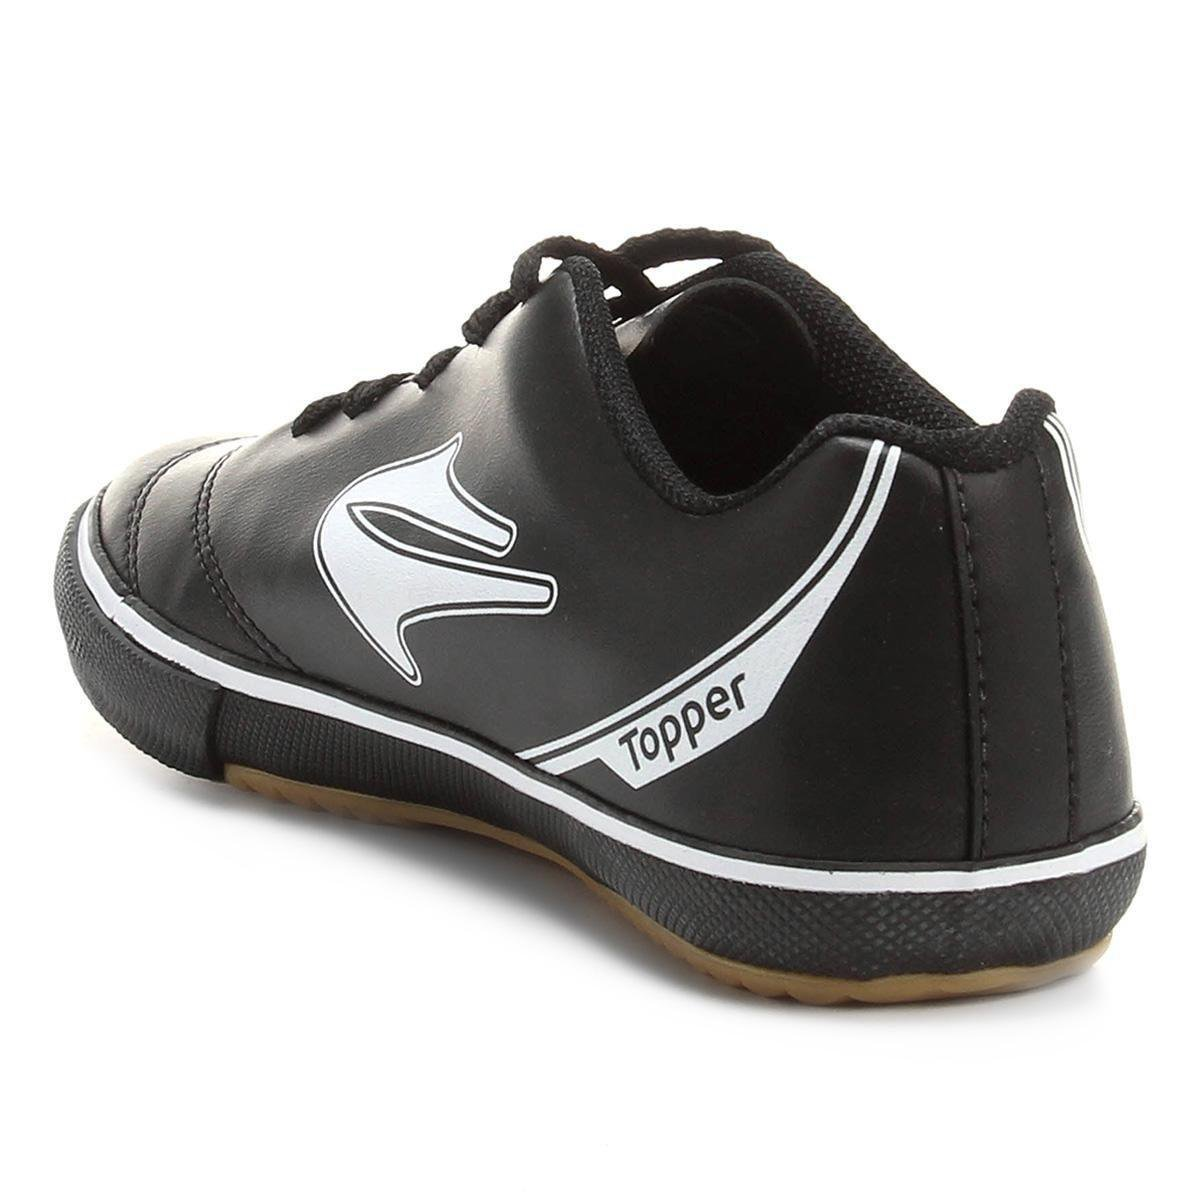 Chuteira Futsal Infantil Topper Boleiro - Preto e Branco - Compre ... 9819d26231839